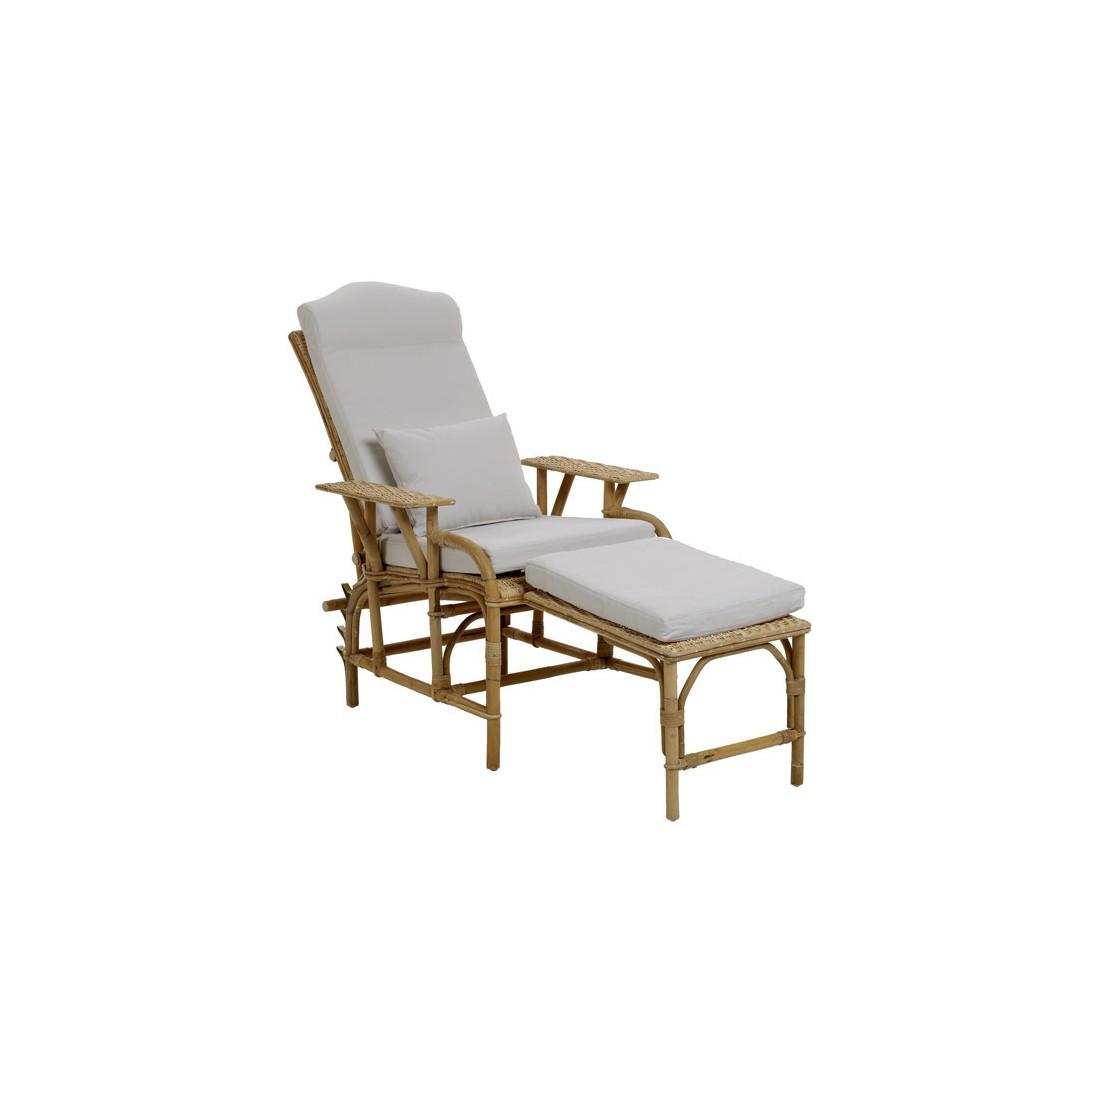 cushion for lounge chair kok maison uk. Black Bedroom Furniture Sets. Home Design Ideas